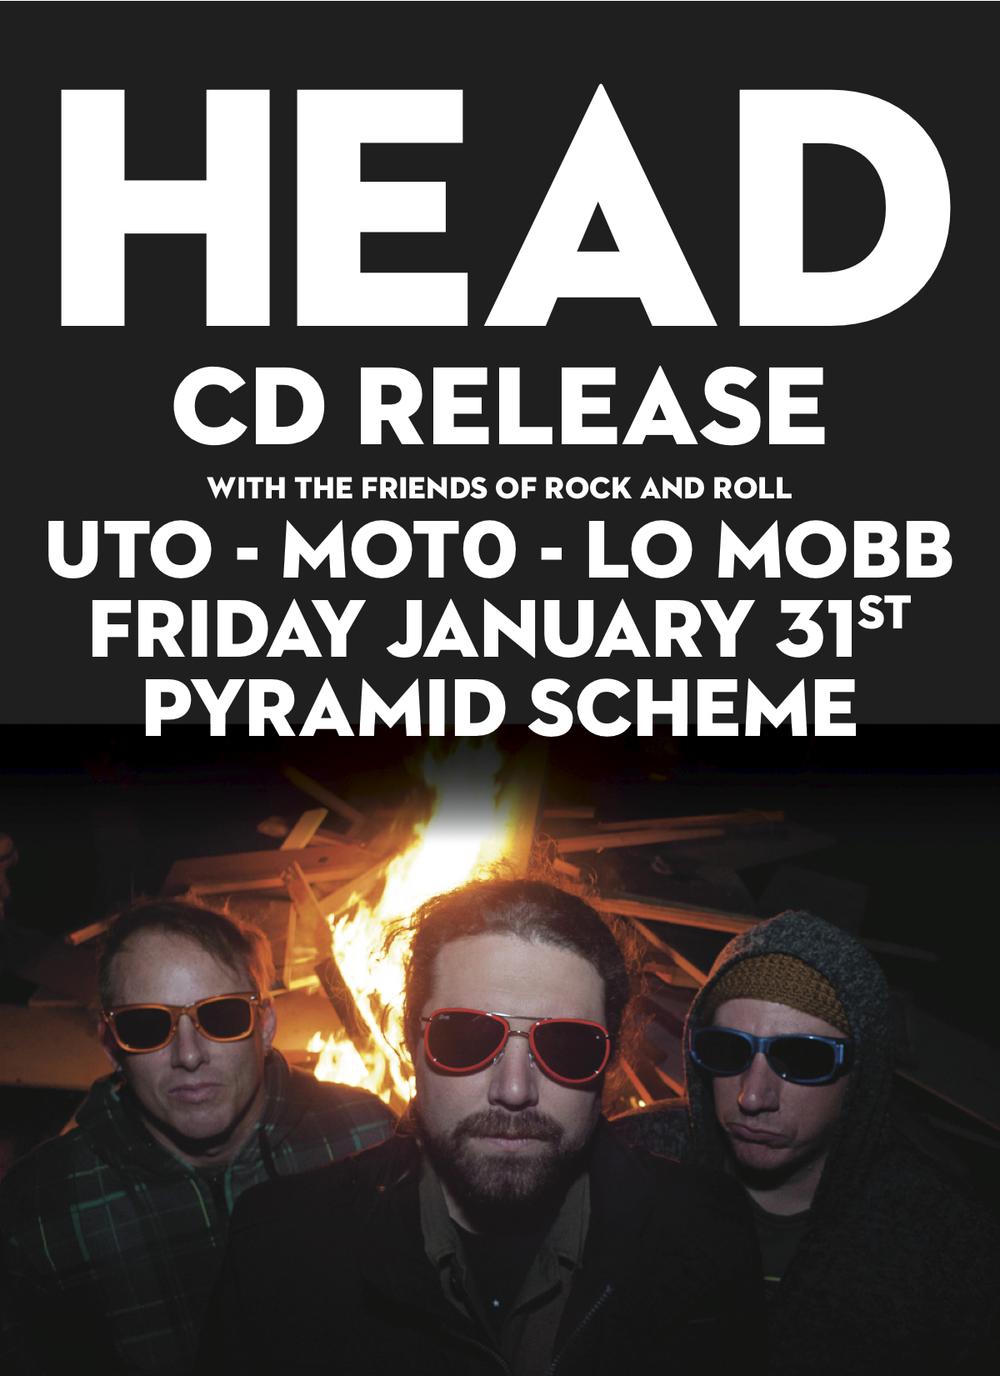 Head CD Release.jpg